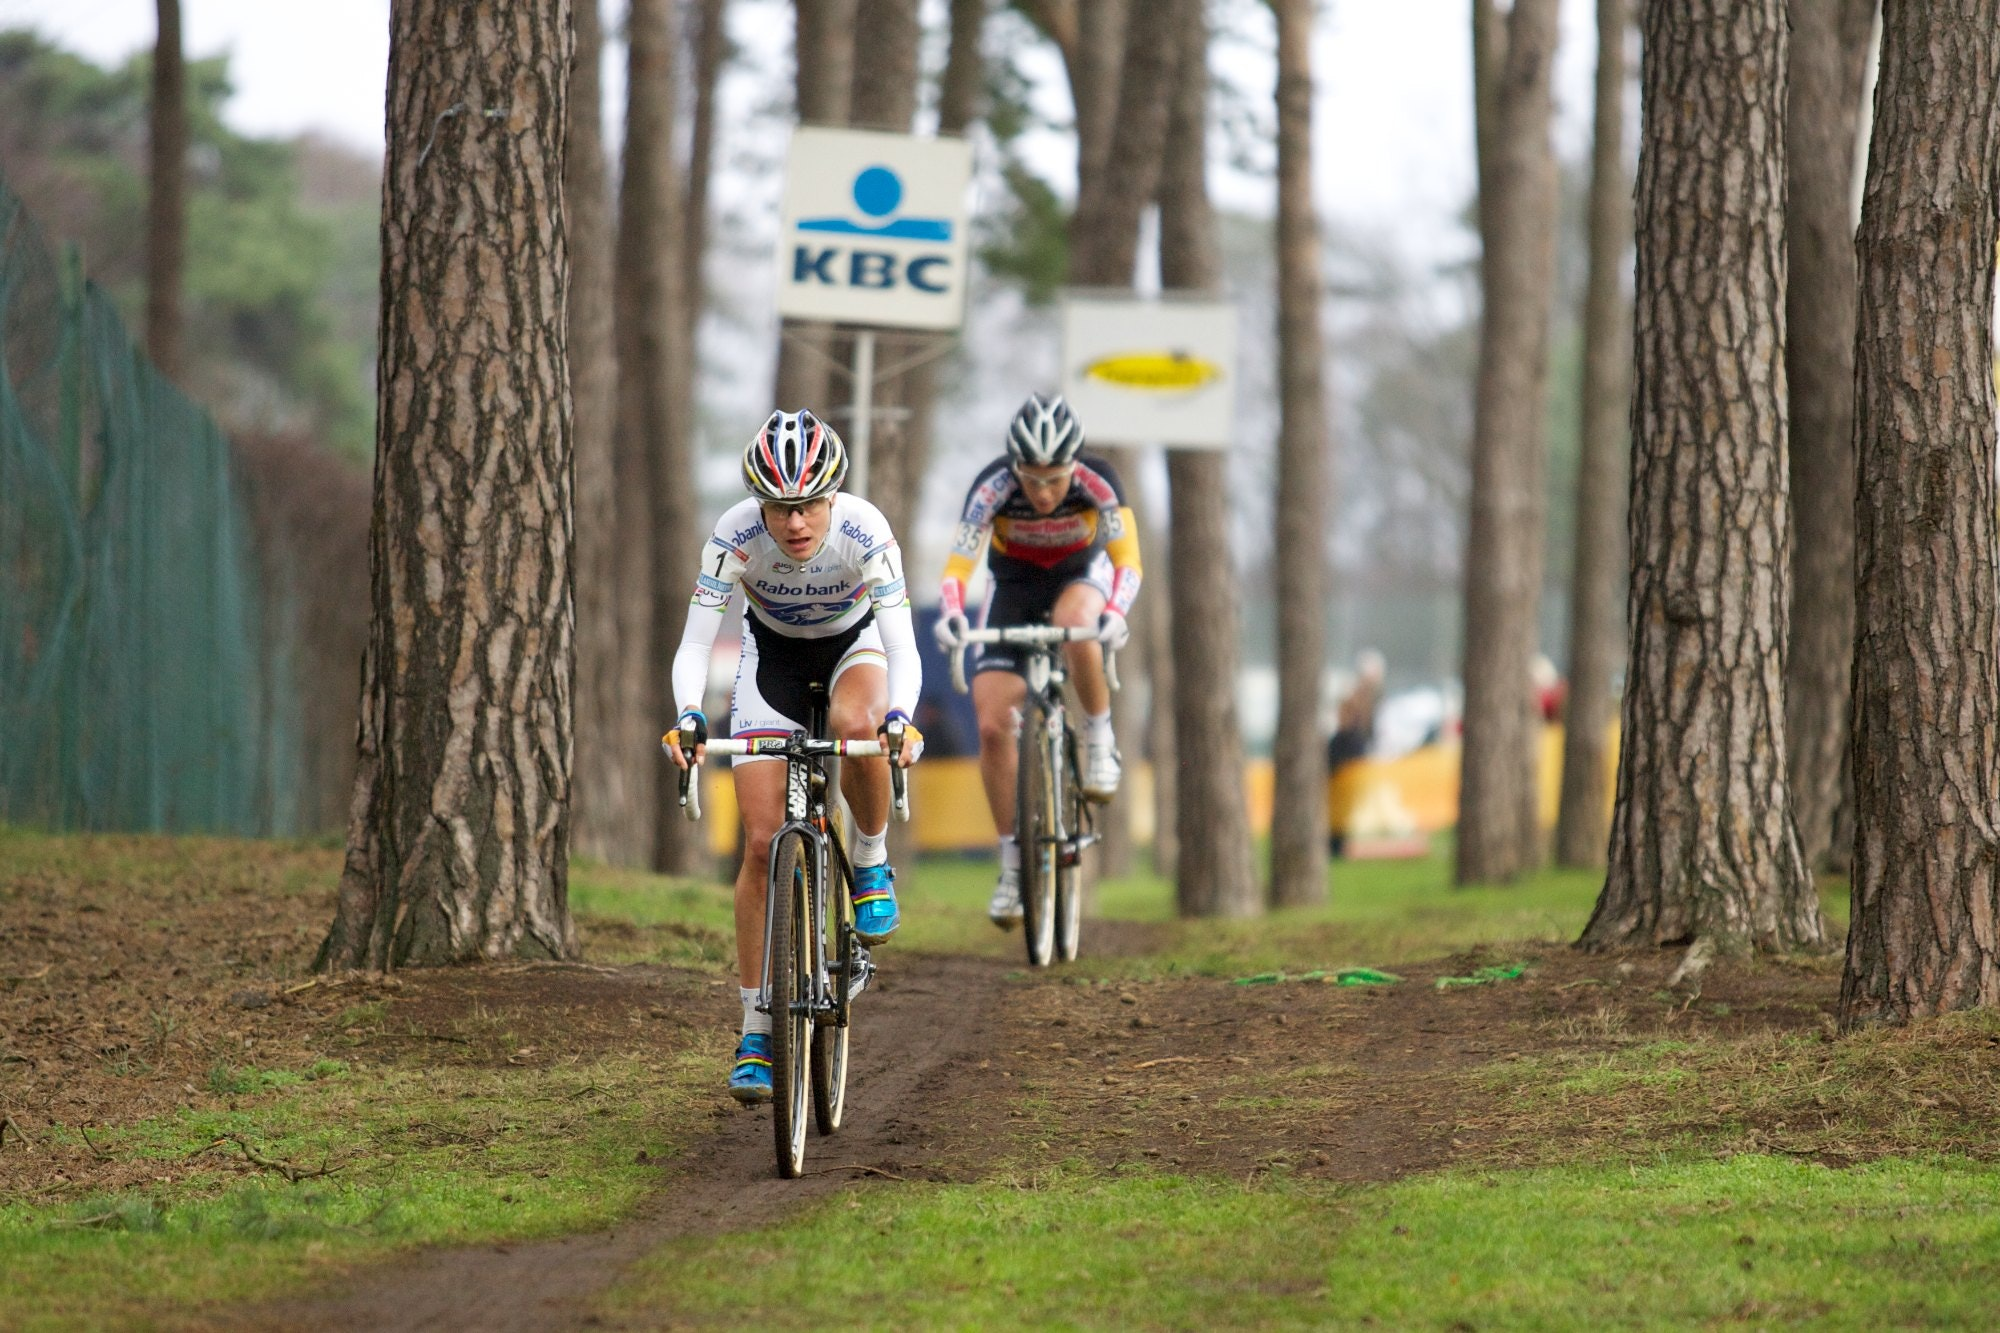 Marianne Vos, Netherlands, Rabobank, cyclo-cross, World Cup, 2013/14, Zolder, pic: Balint Hamvas